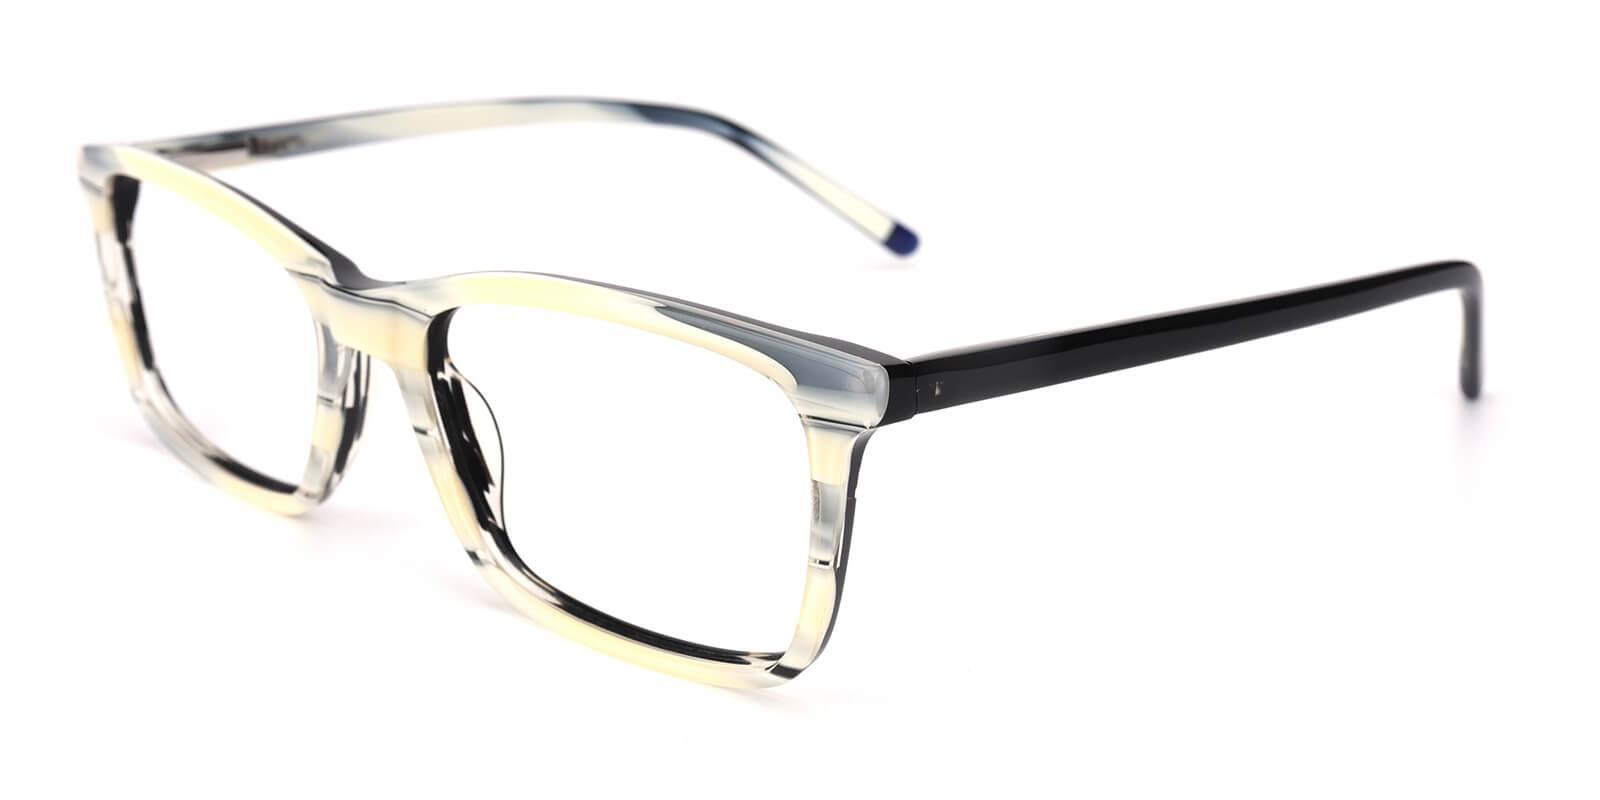 Crane-Pattern-Rectangle-Acetate-Eyeglasses-additional1